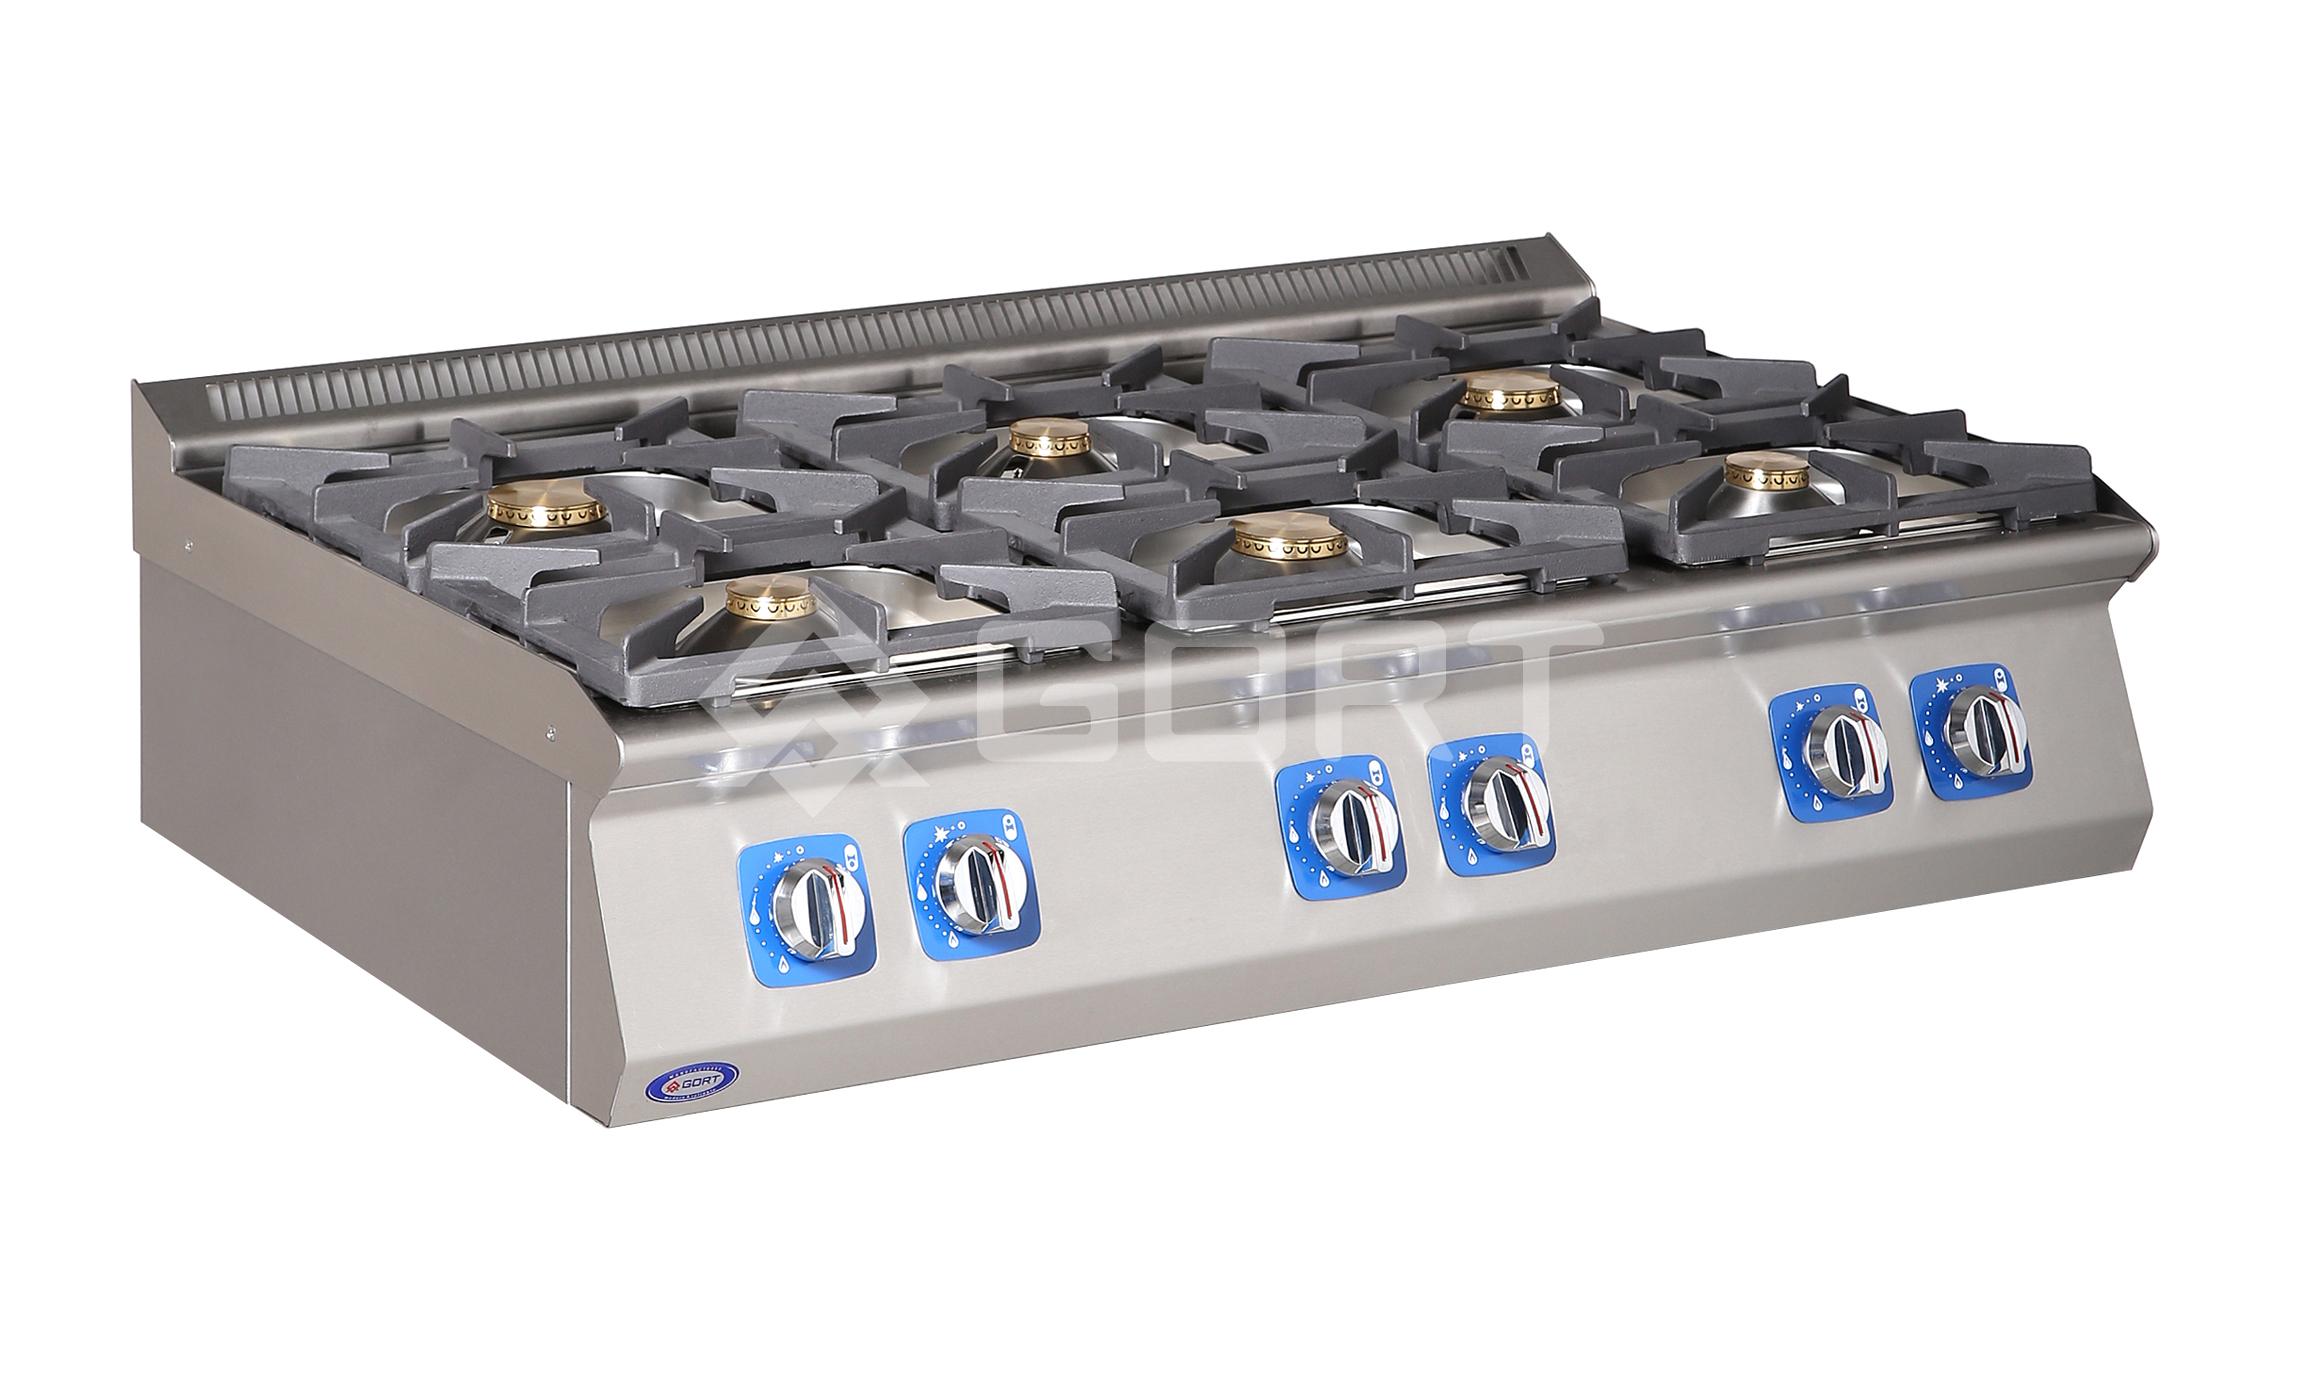 Kuchnia gazowa 6-palnikowa nastawiana